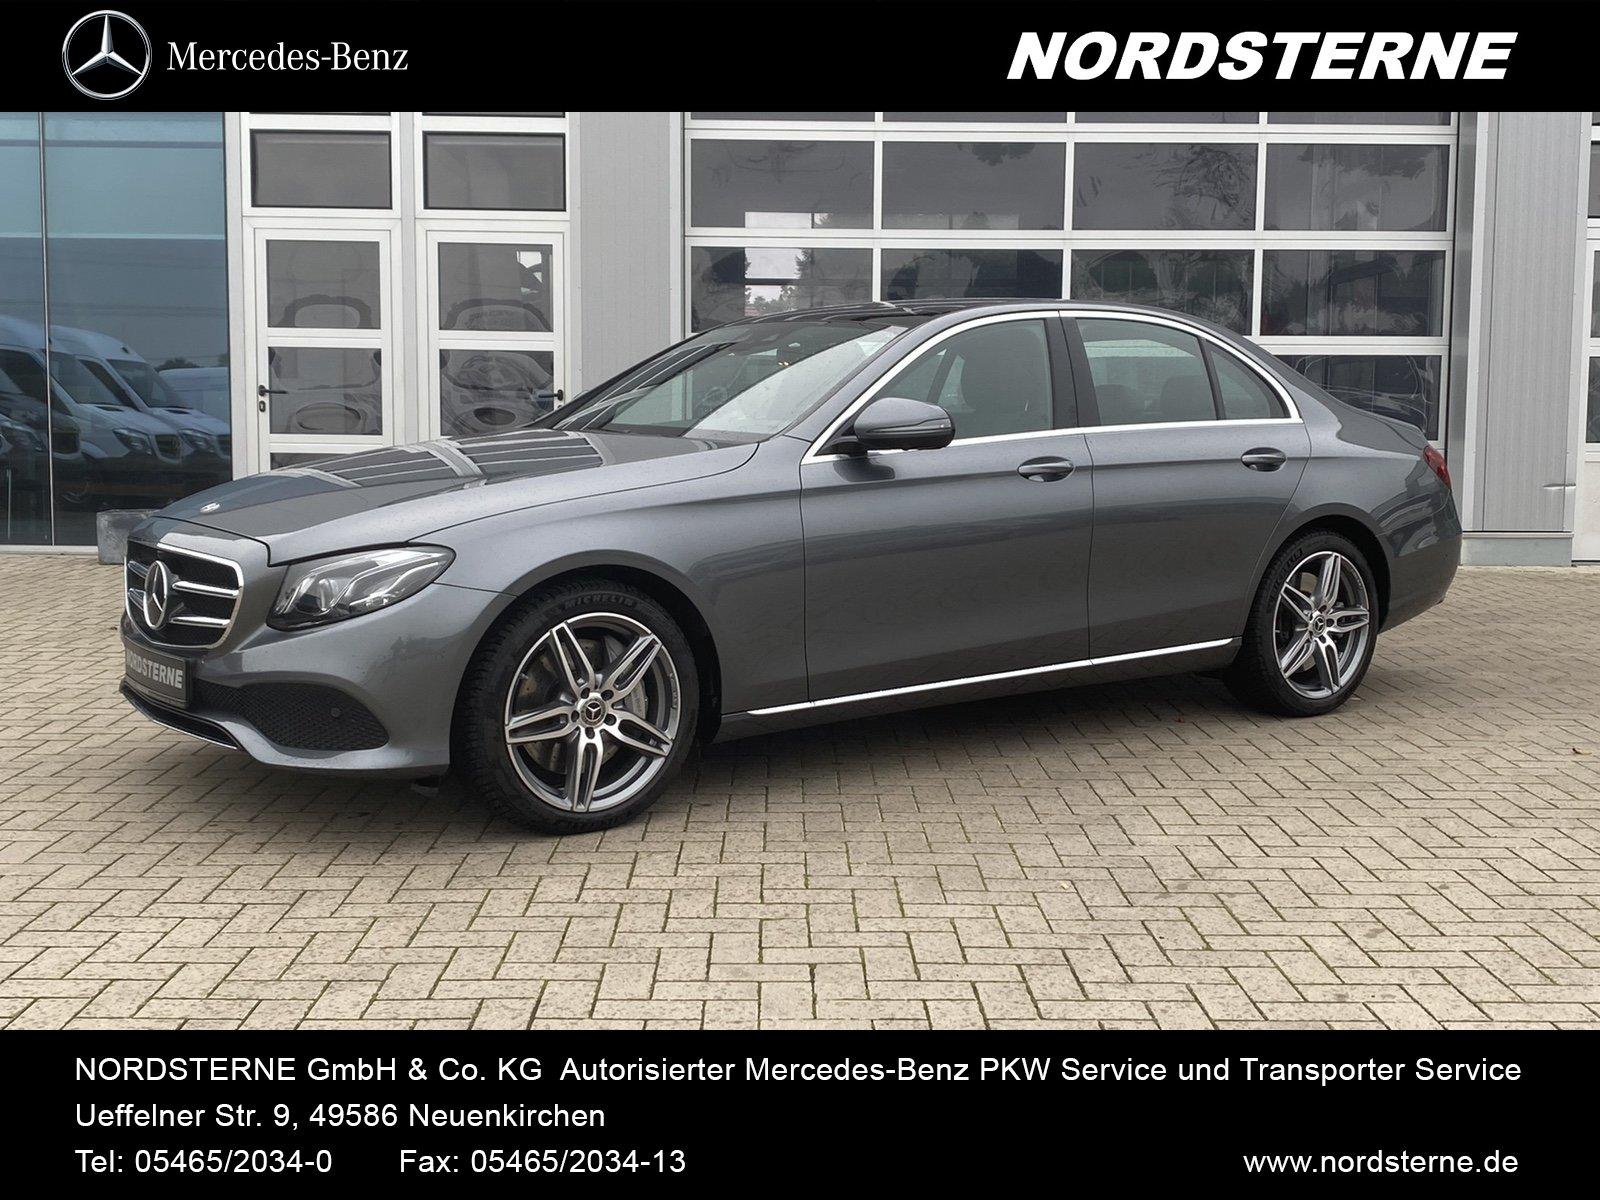 Mercedes-Benz E 450 4MATIC Limousine+AMG-ALU+COM+WIDE+PANO+360, Jahr 2019, Benzin